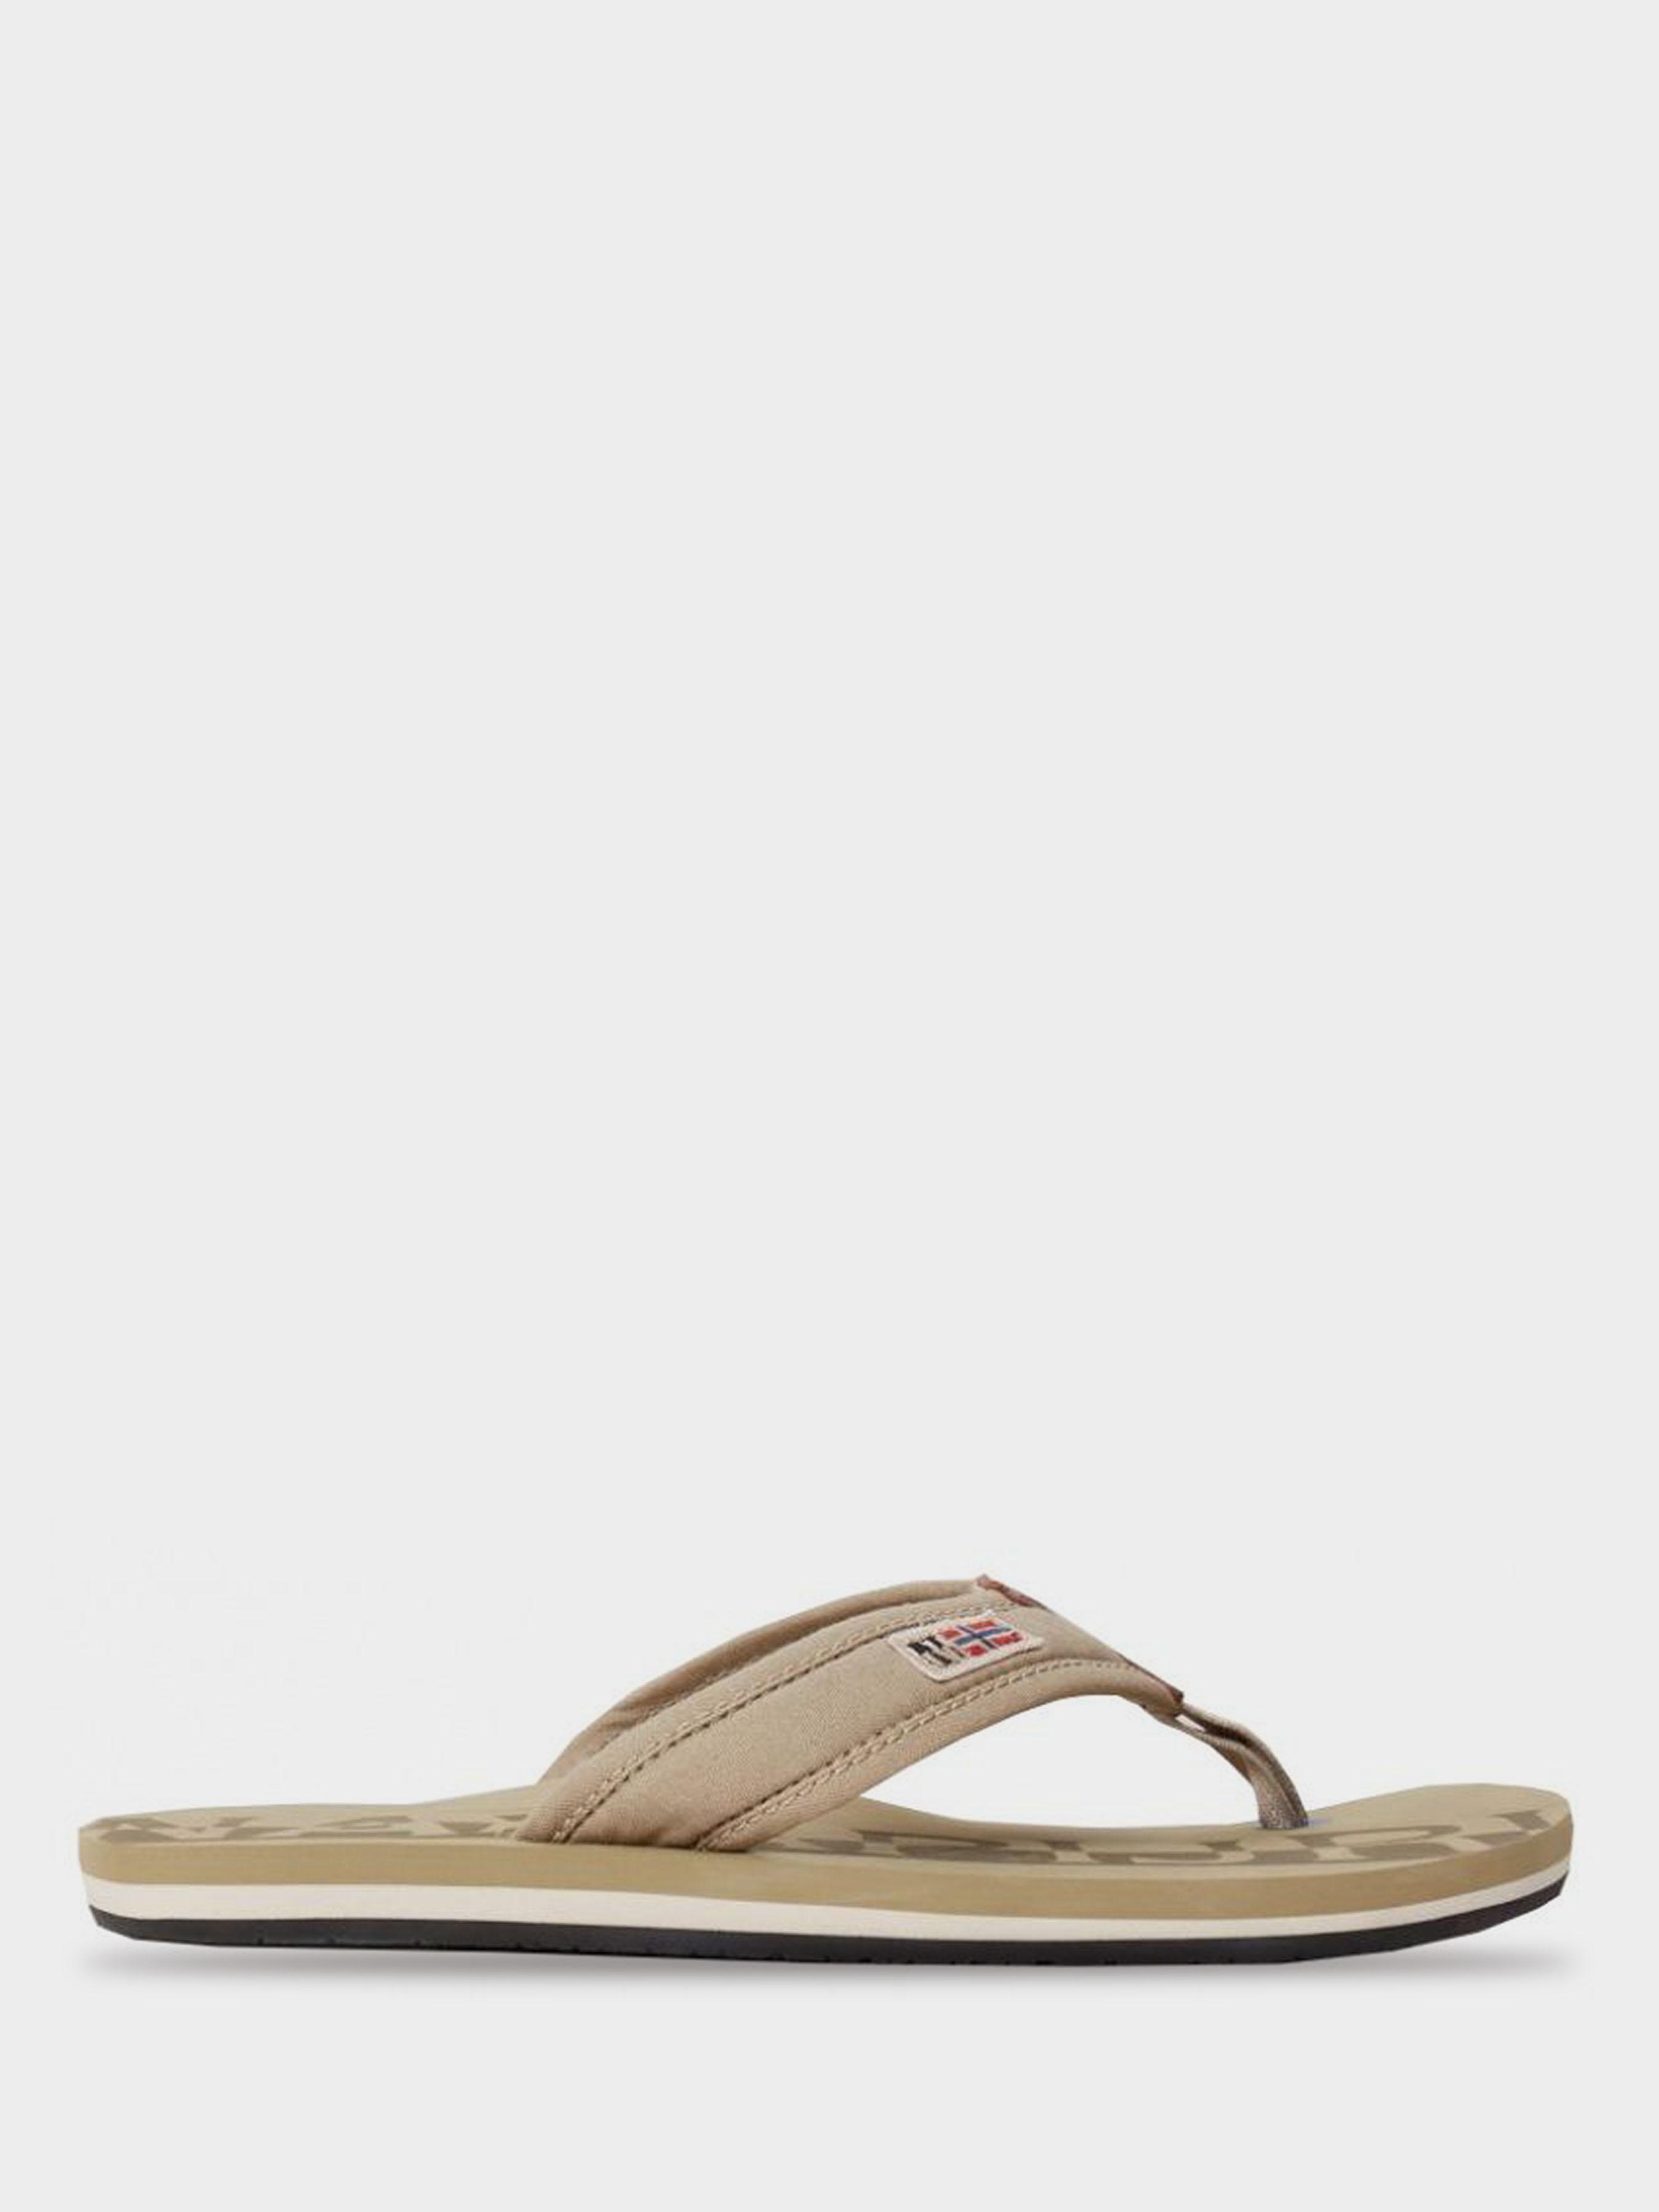 Вьетнамки для мужчин Napapijri NP62 размеры обуви, 2017